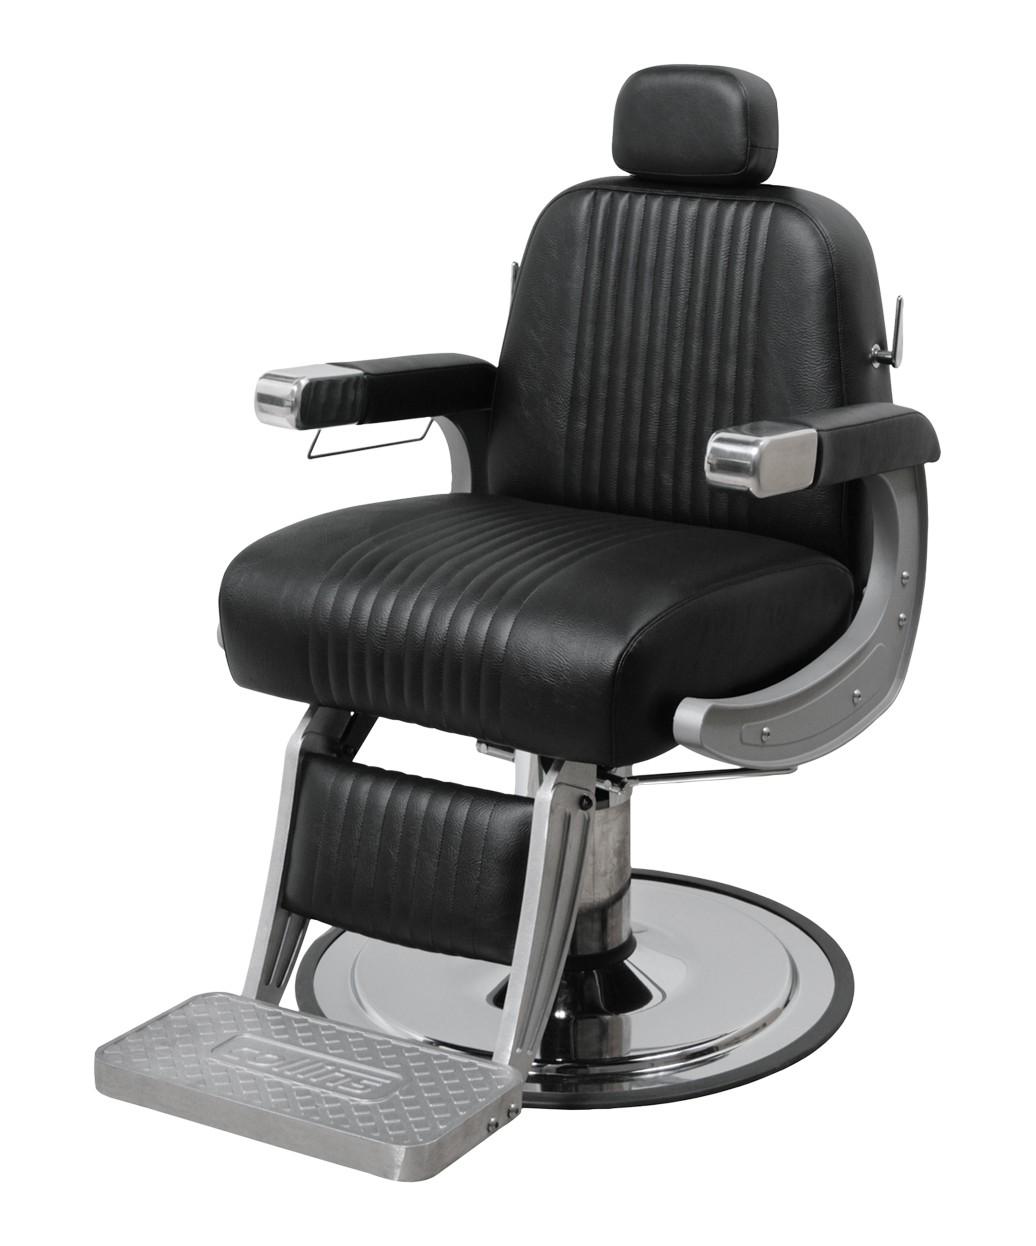 on sale 29bb6 1cd28 Collins B70 Cobalt Omega Barber Chair